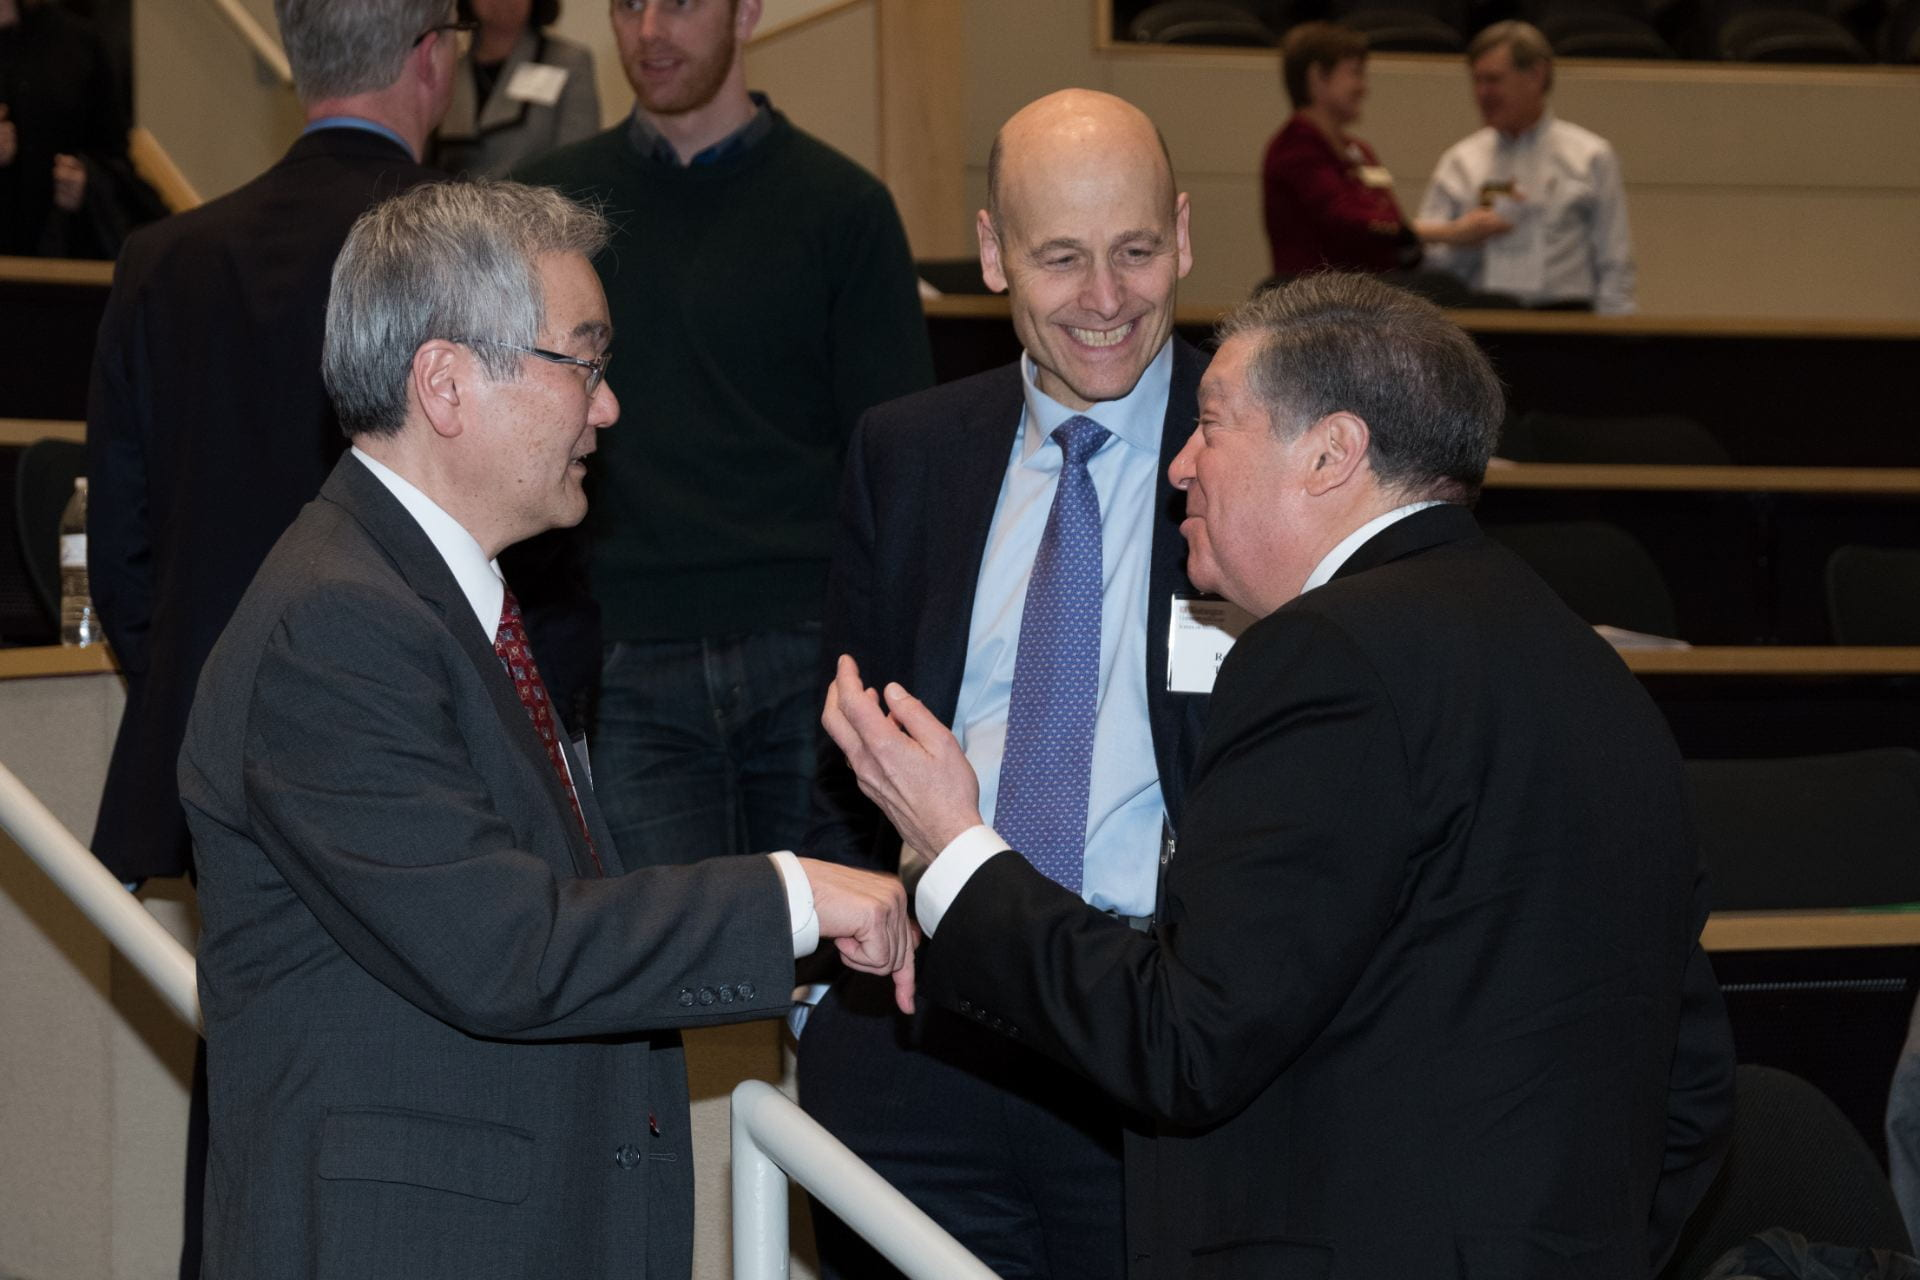 Wayne Yokoyama, Bob Tepper and Bob Schreiber